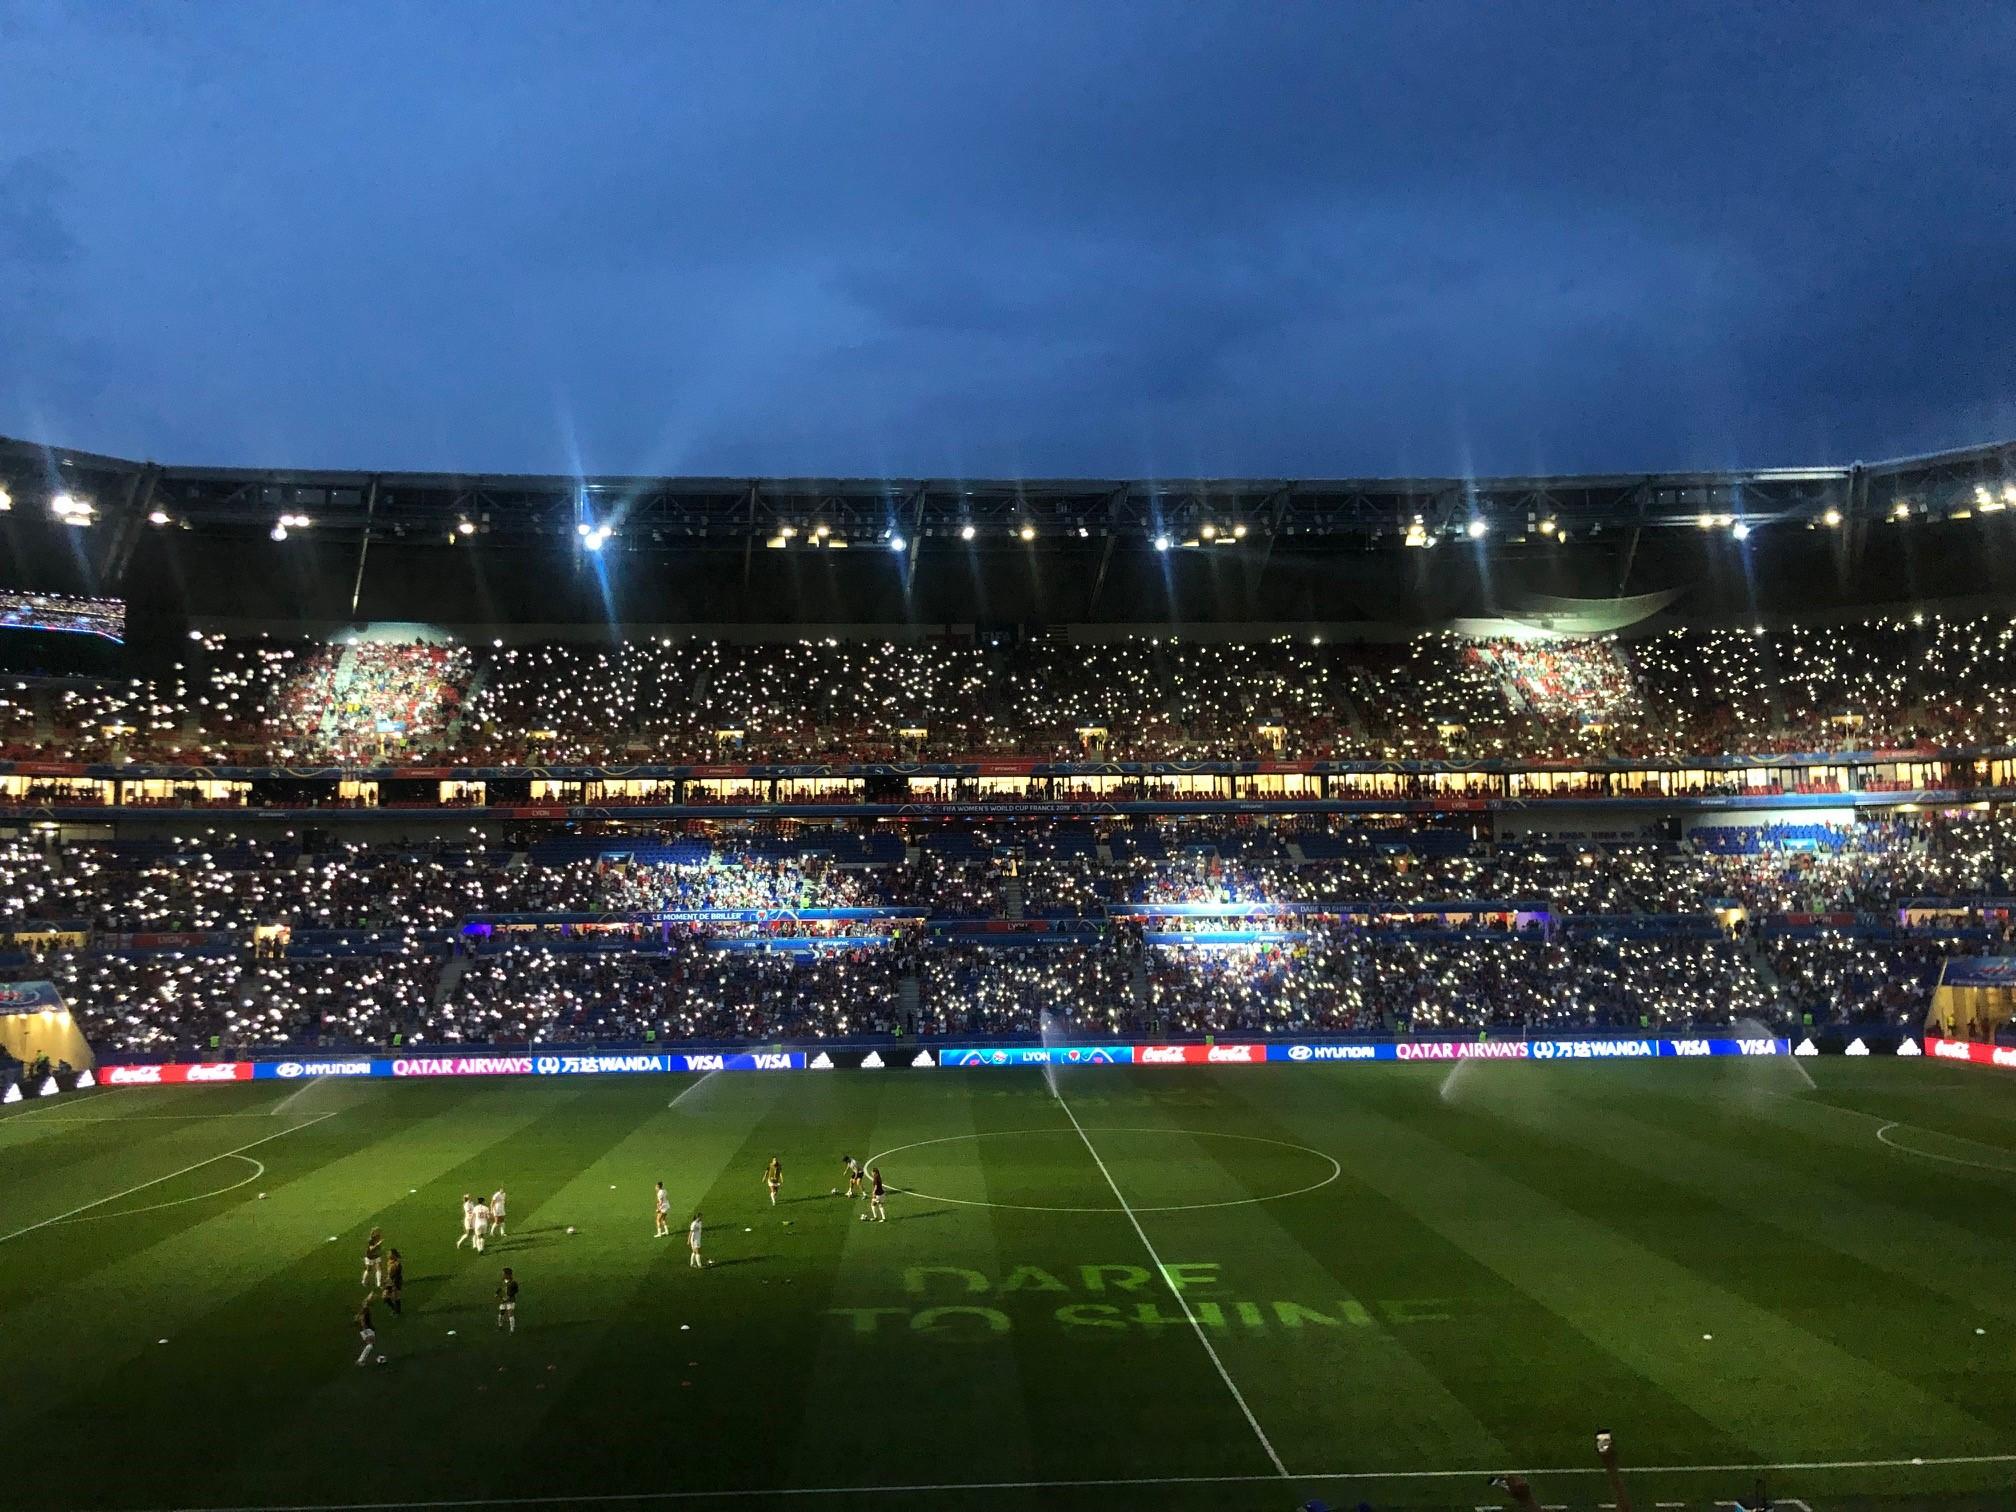 Women's World Cup, Lyon, France